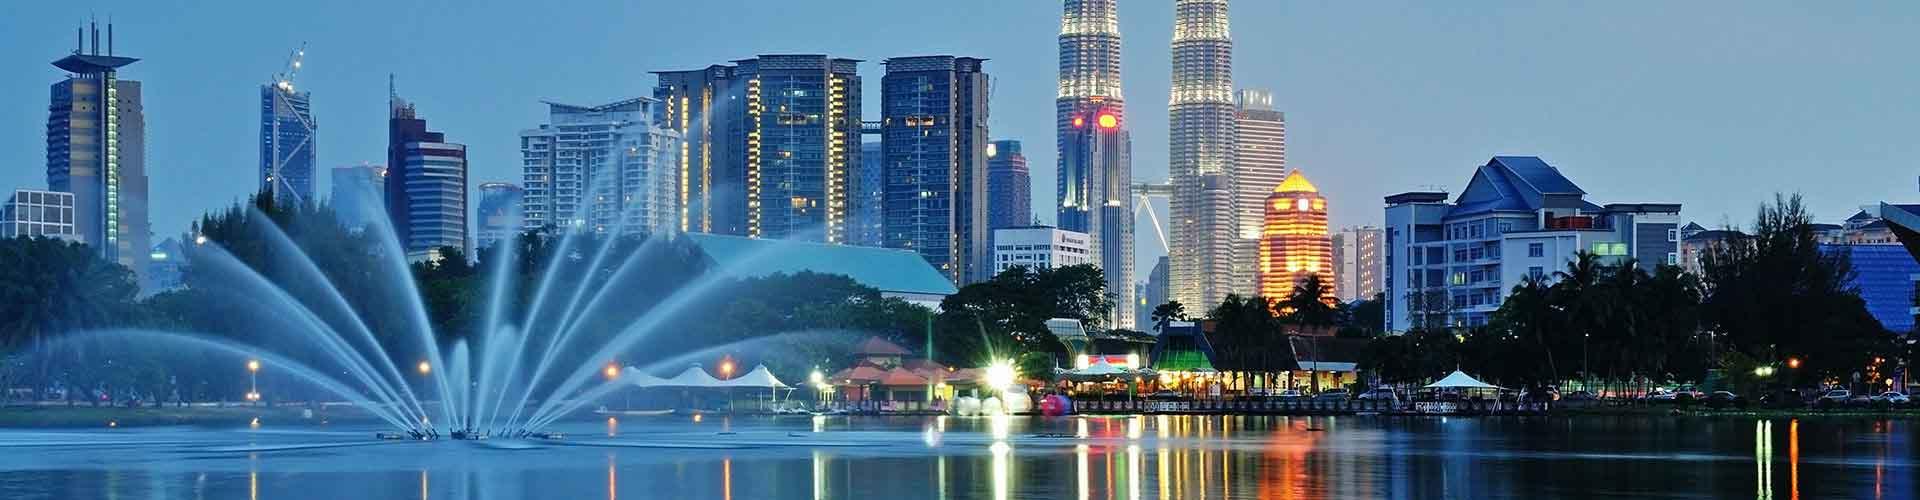 Kuala Lumpur – Hostels em Kuala Lumpur. Mapas para Kuala Lumpur, Fotos e Avaliações para cada Hostels em Kuala Lumpur.